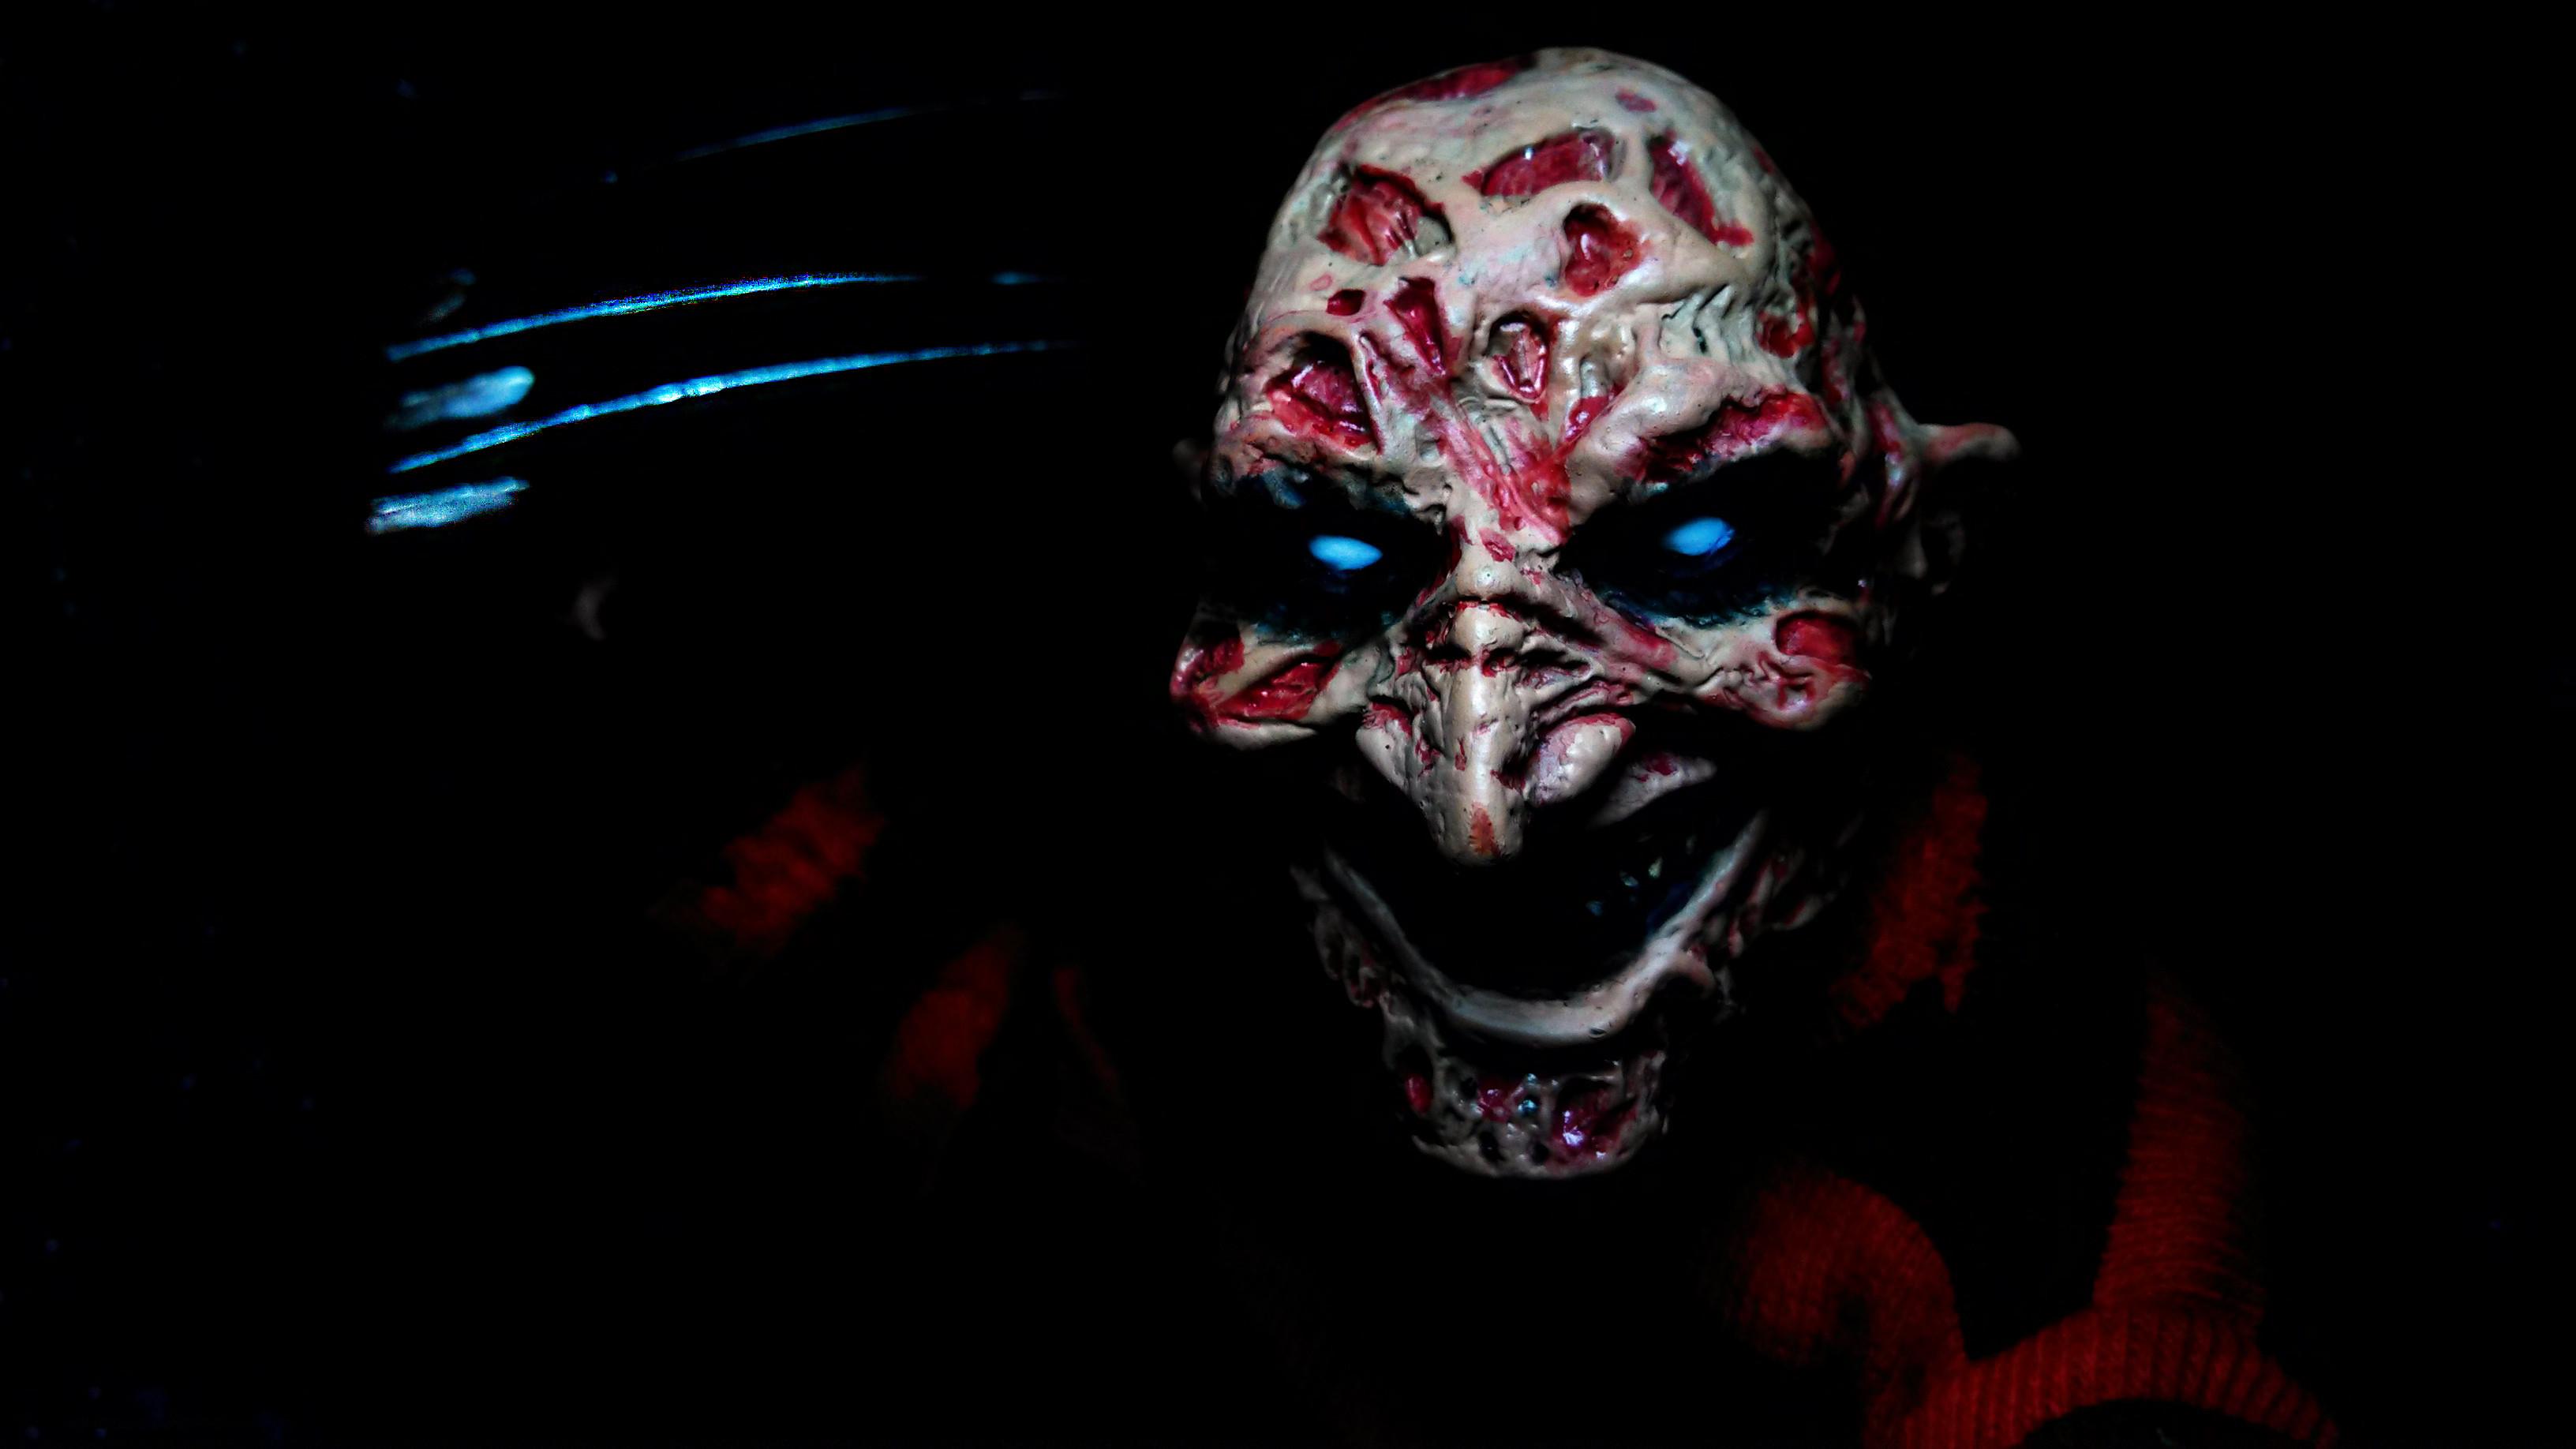 Freddy Krueger Wallpaper Funny – Doblelol.com